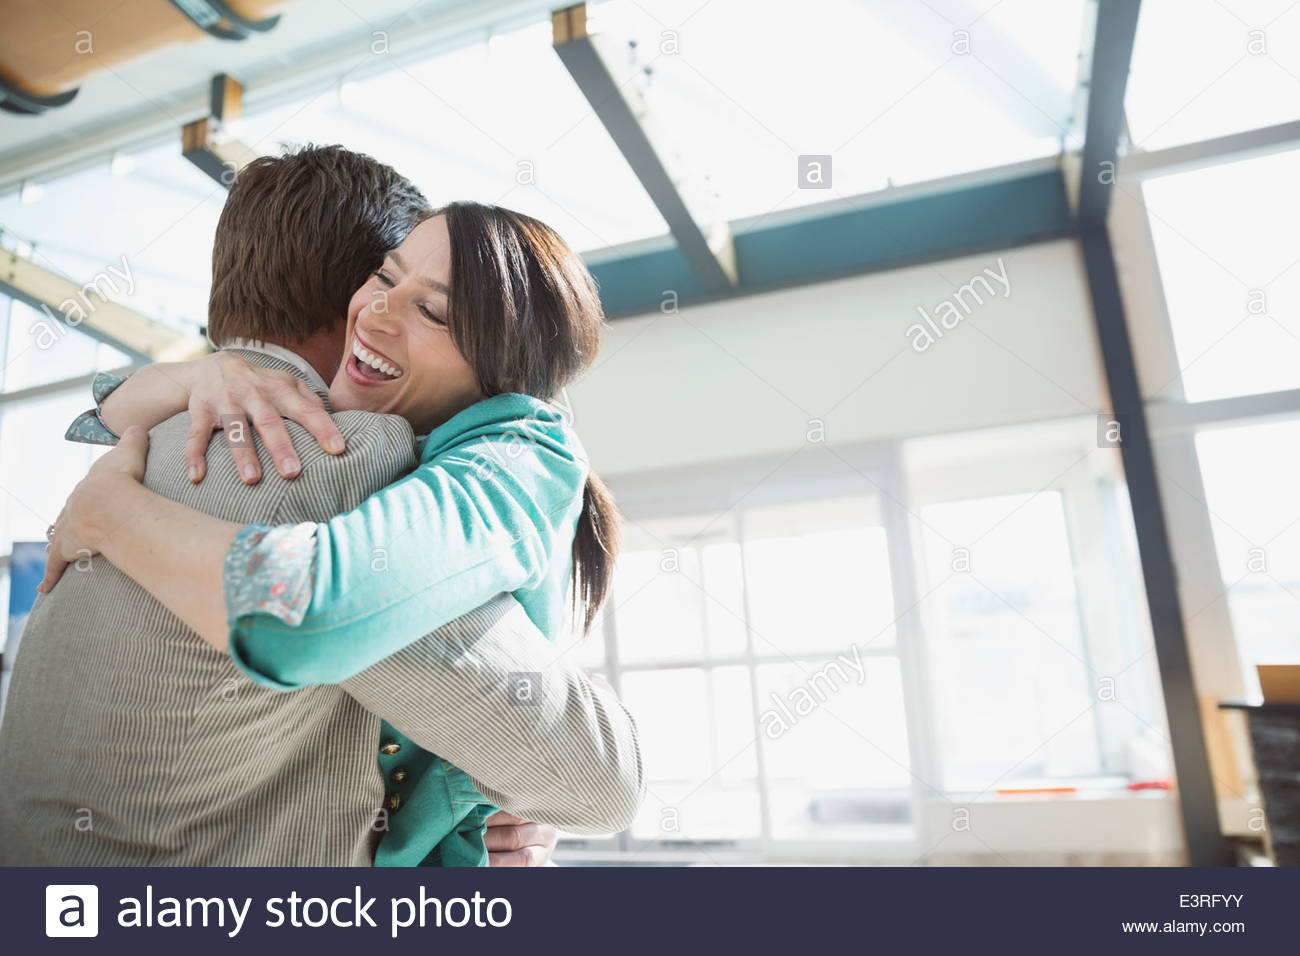 Begeisterten paar umarmt in Flughafen Stockbild